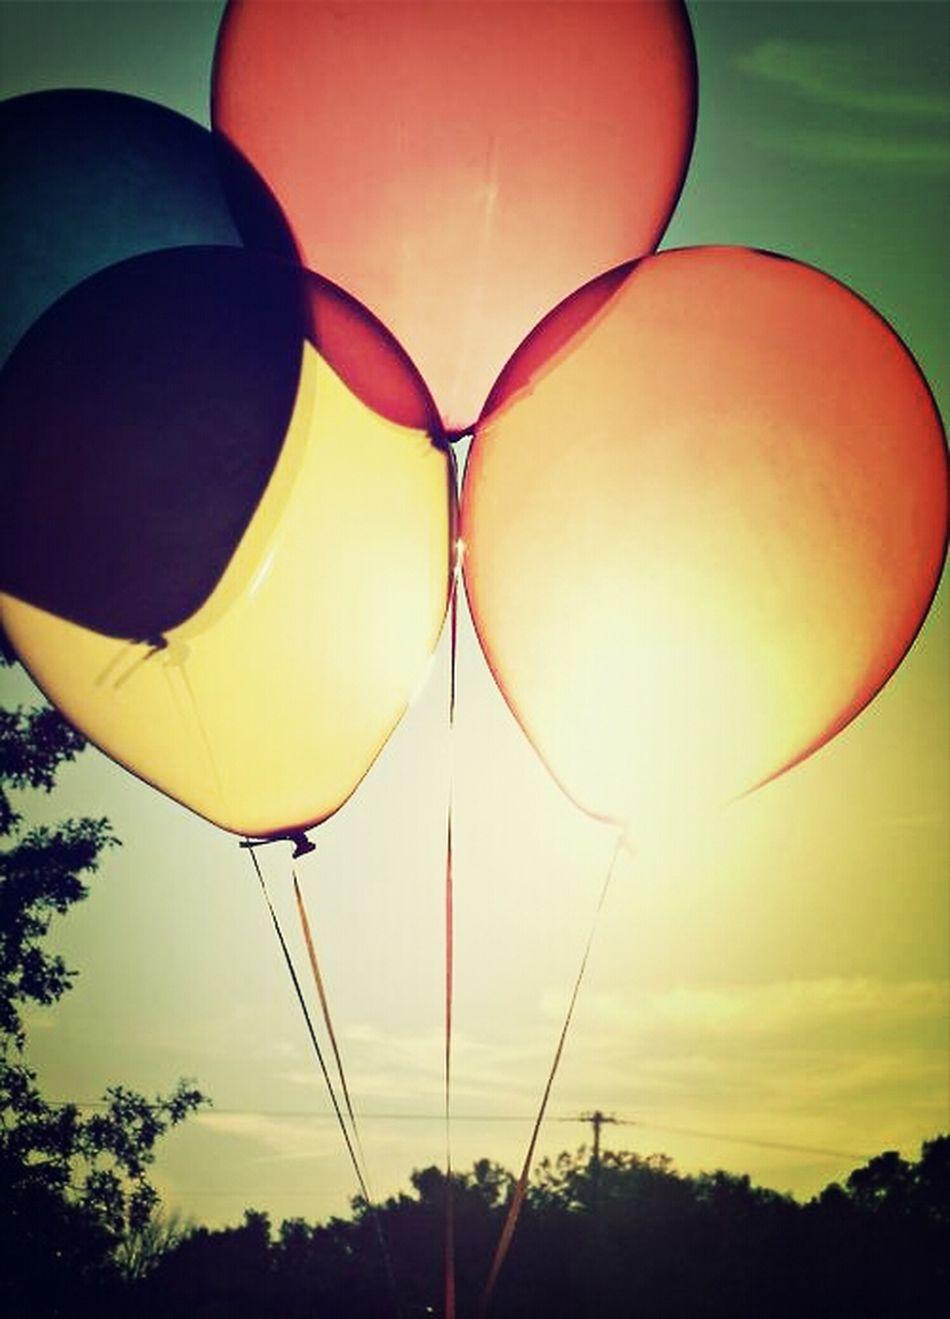 Balloons Having Fun With Ballons Colorful Balloons